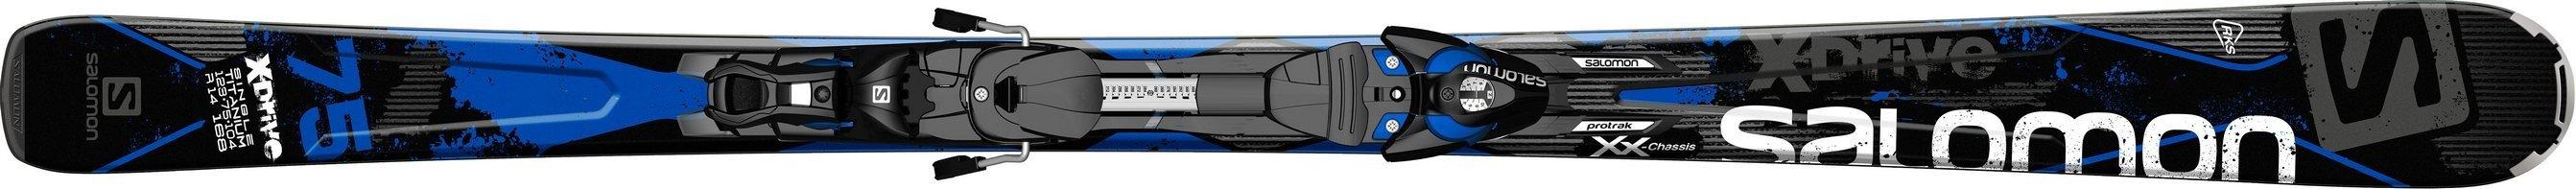 X-DRIVE 75